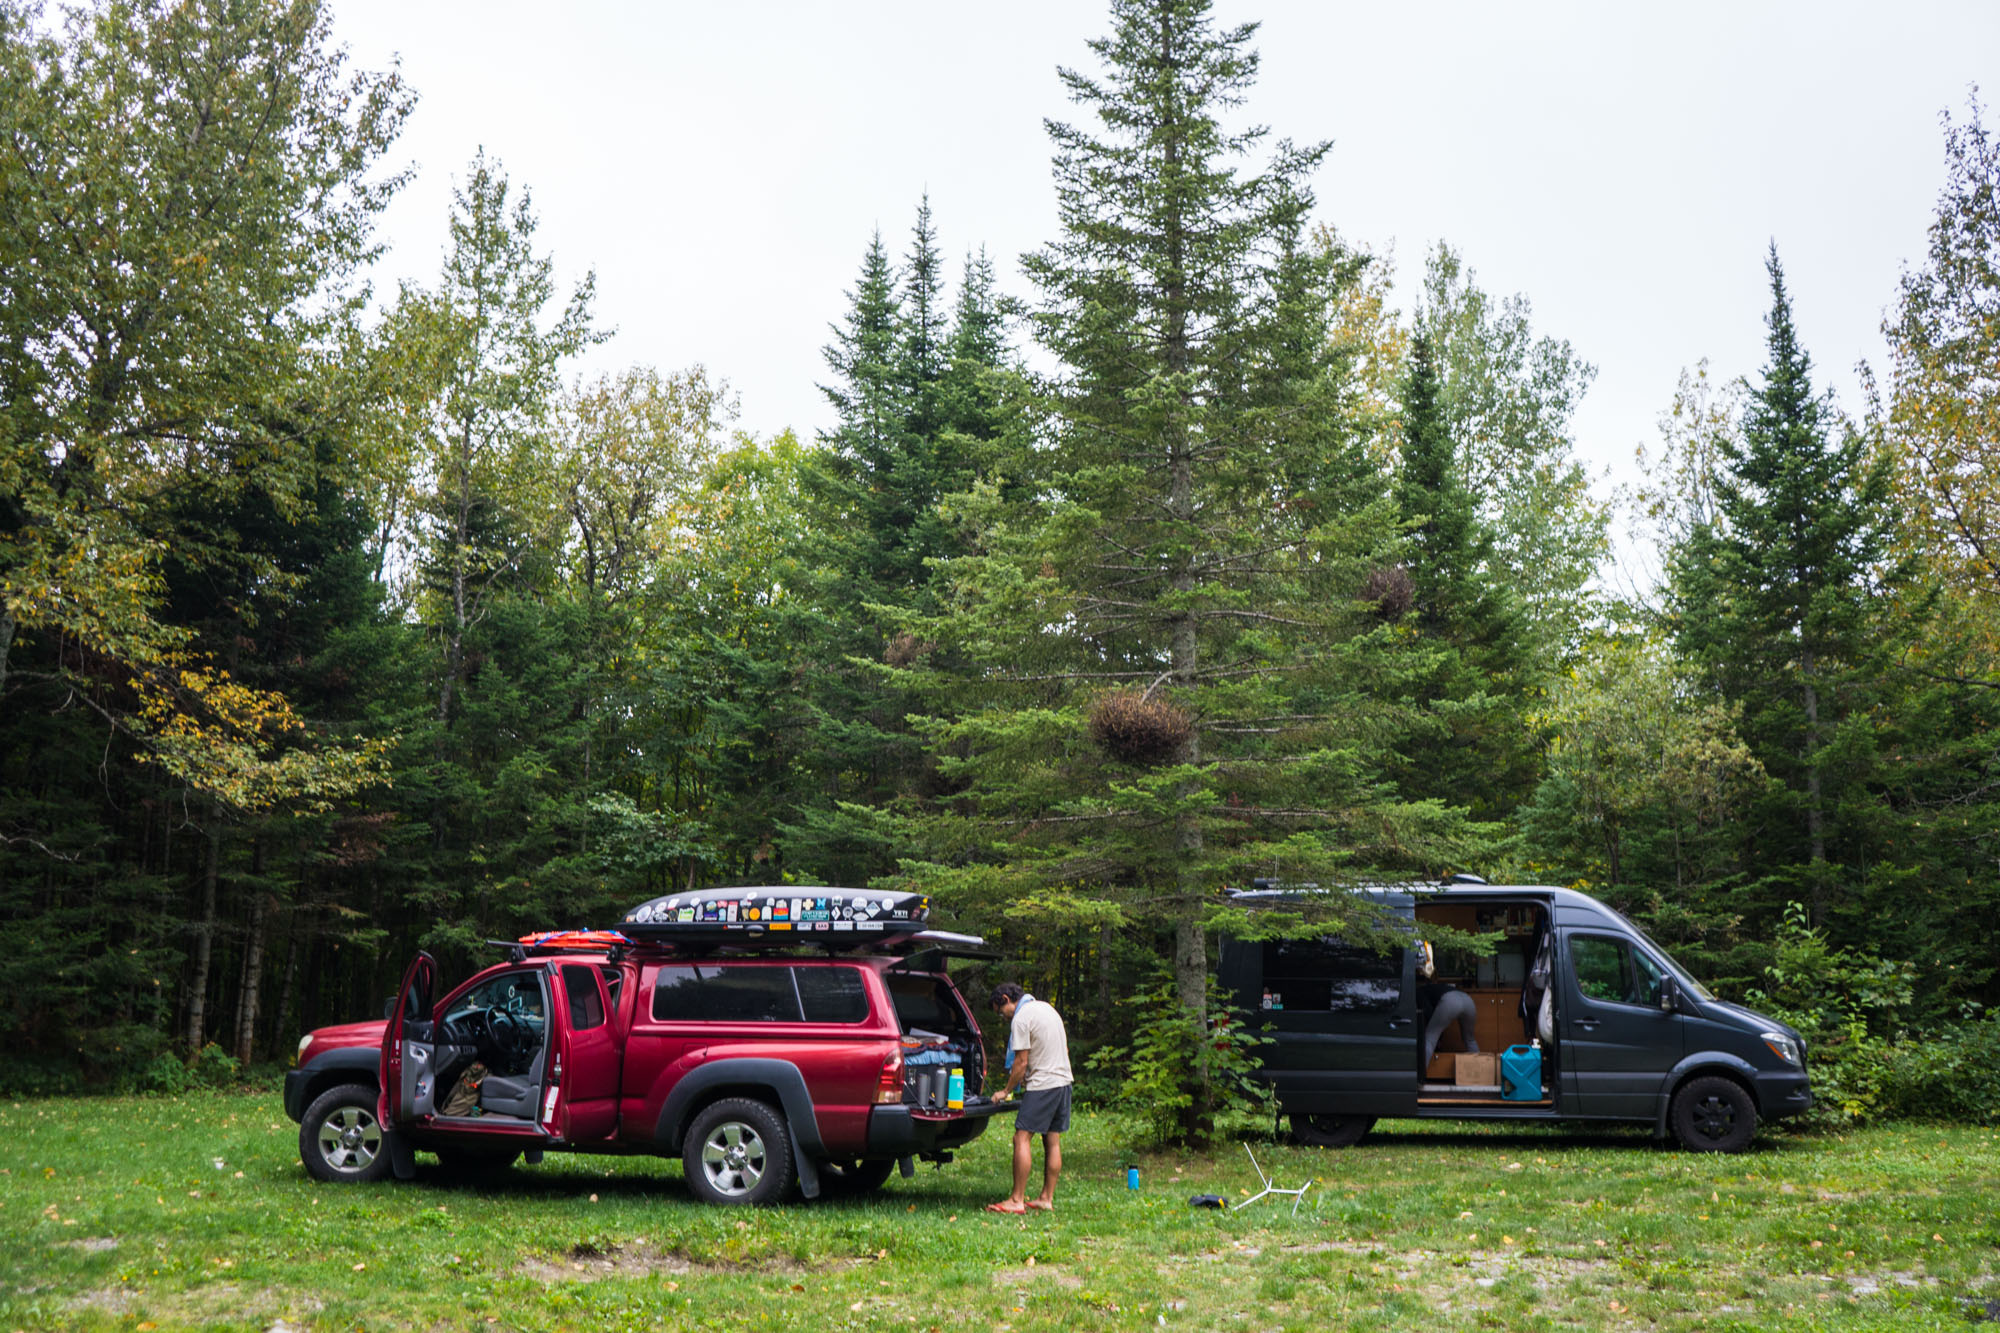 The many campsites around Domaine du Radar